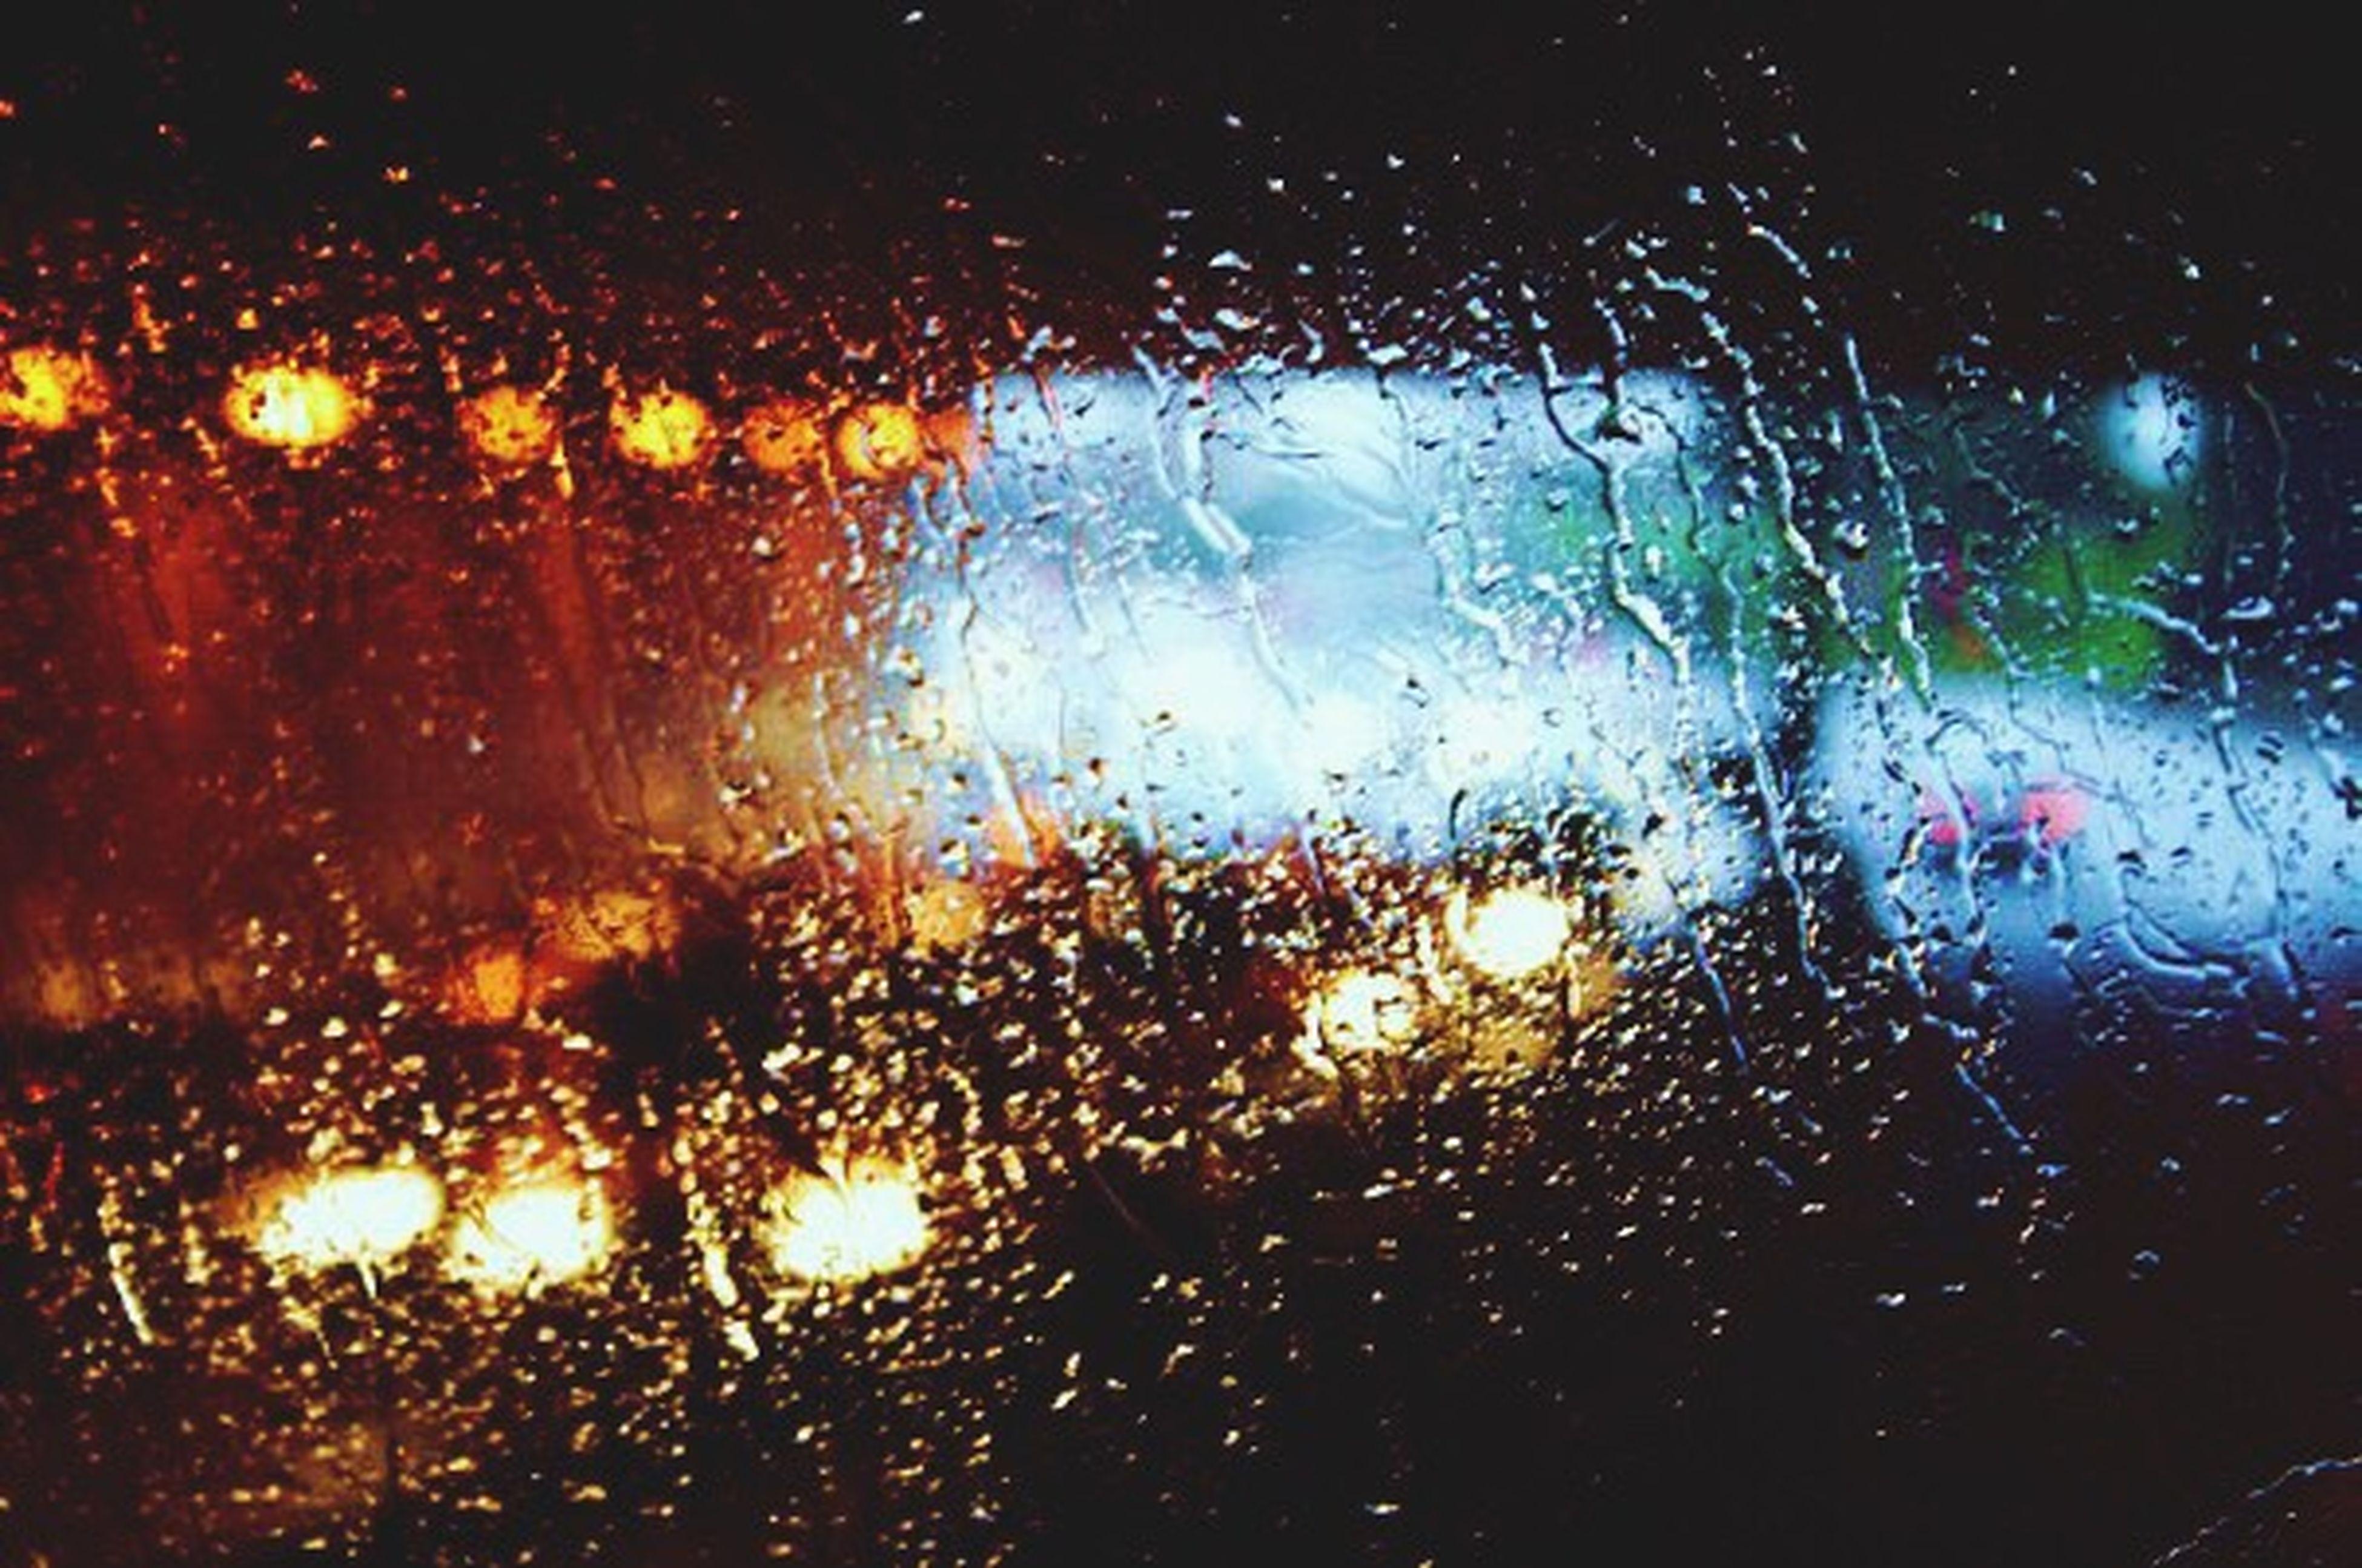 wet, drop, water, rain, window, transparent, glass - material, season, raindrop, weather, indoors, car, sky, full frame, glass, monsoon, backgrounds, land vehicle, rainy season, vehicle interior